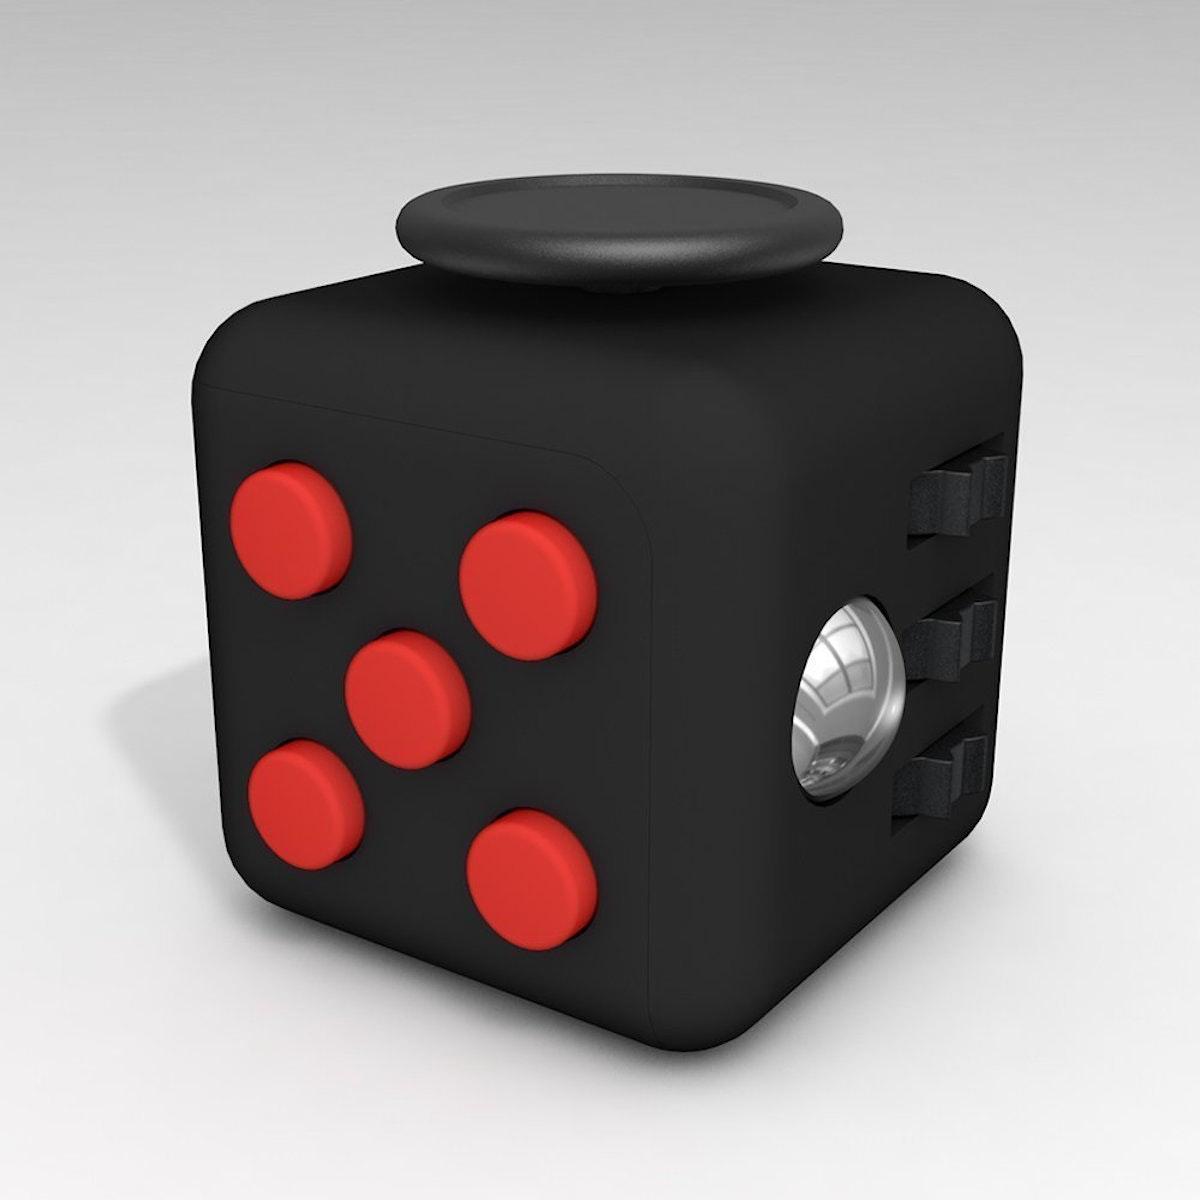 This fidget cube that's way better than a fidget spinner